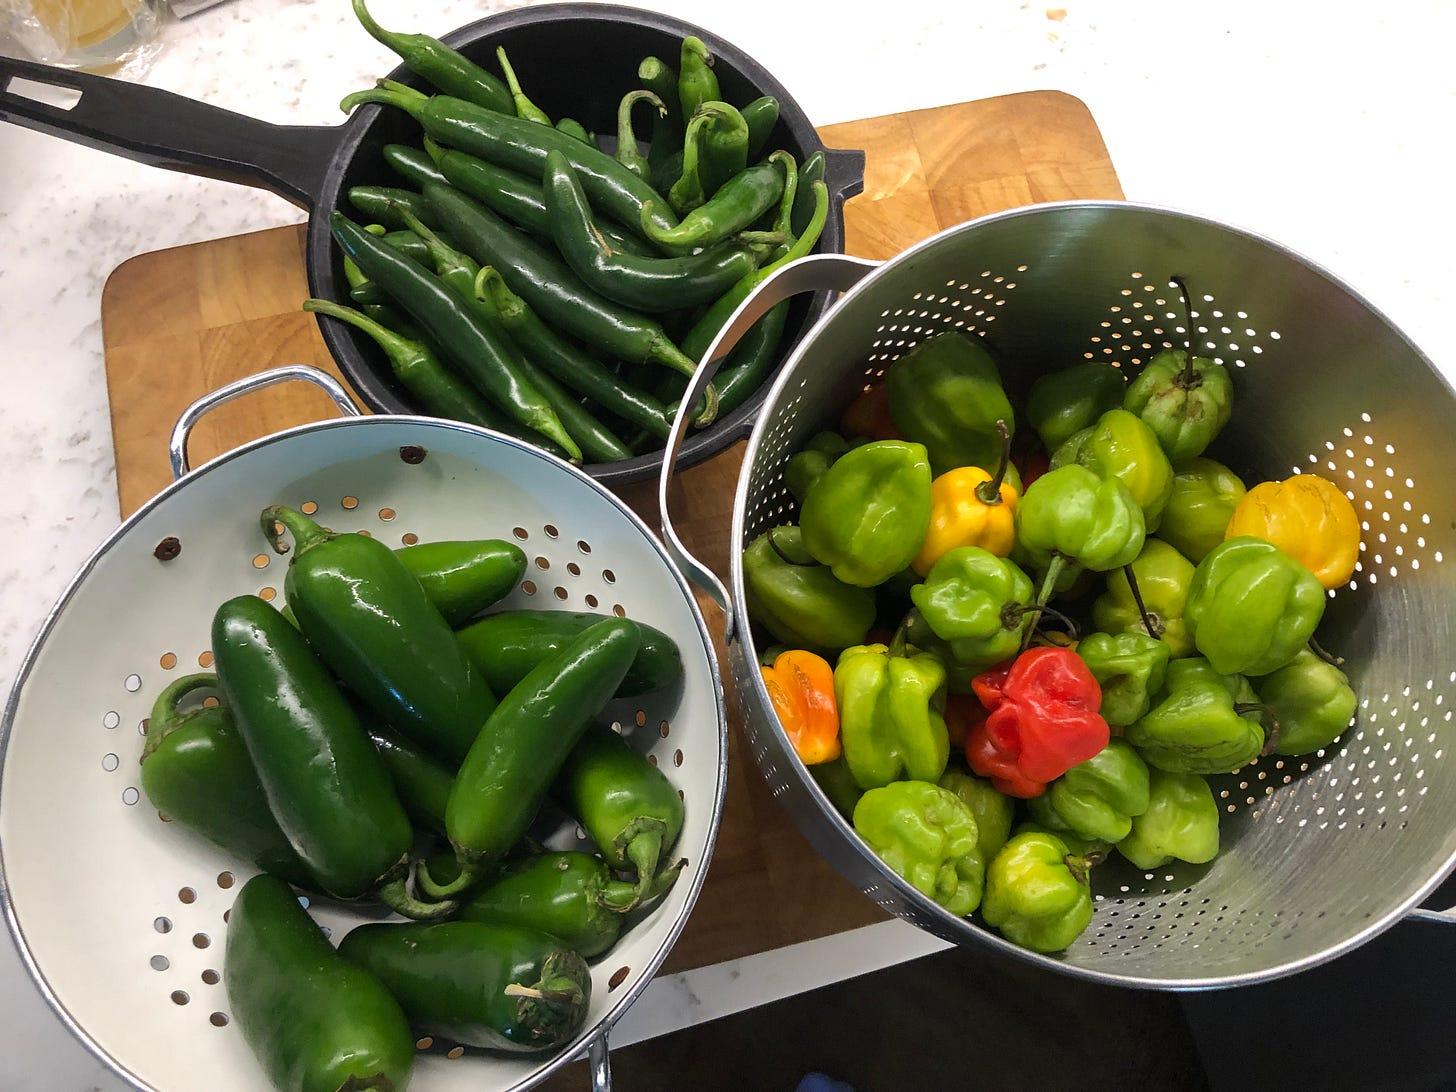 Three colanders holding Serrano, Habanero, and Jalapeño peppers